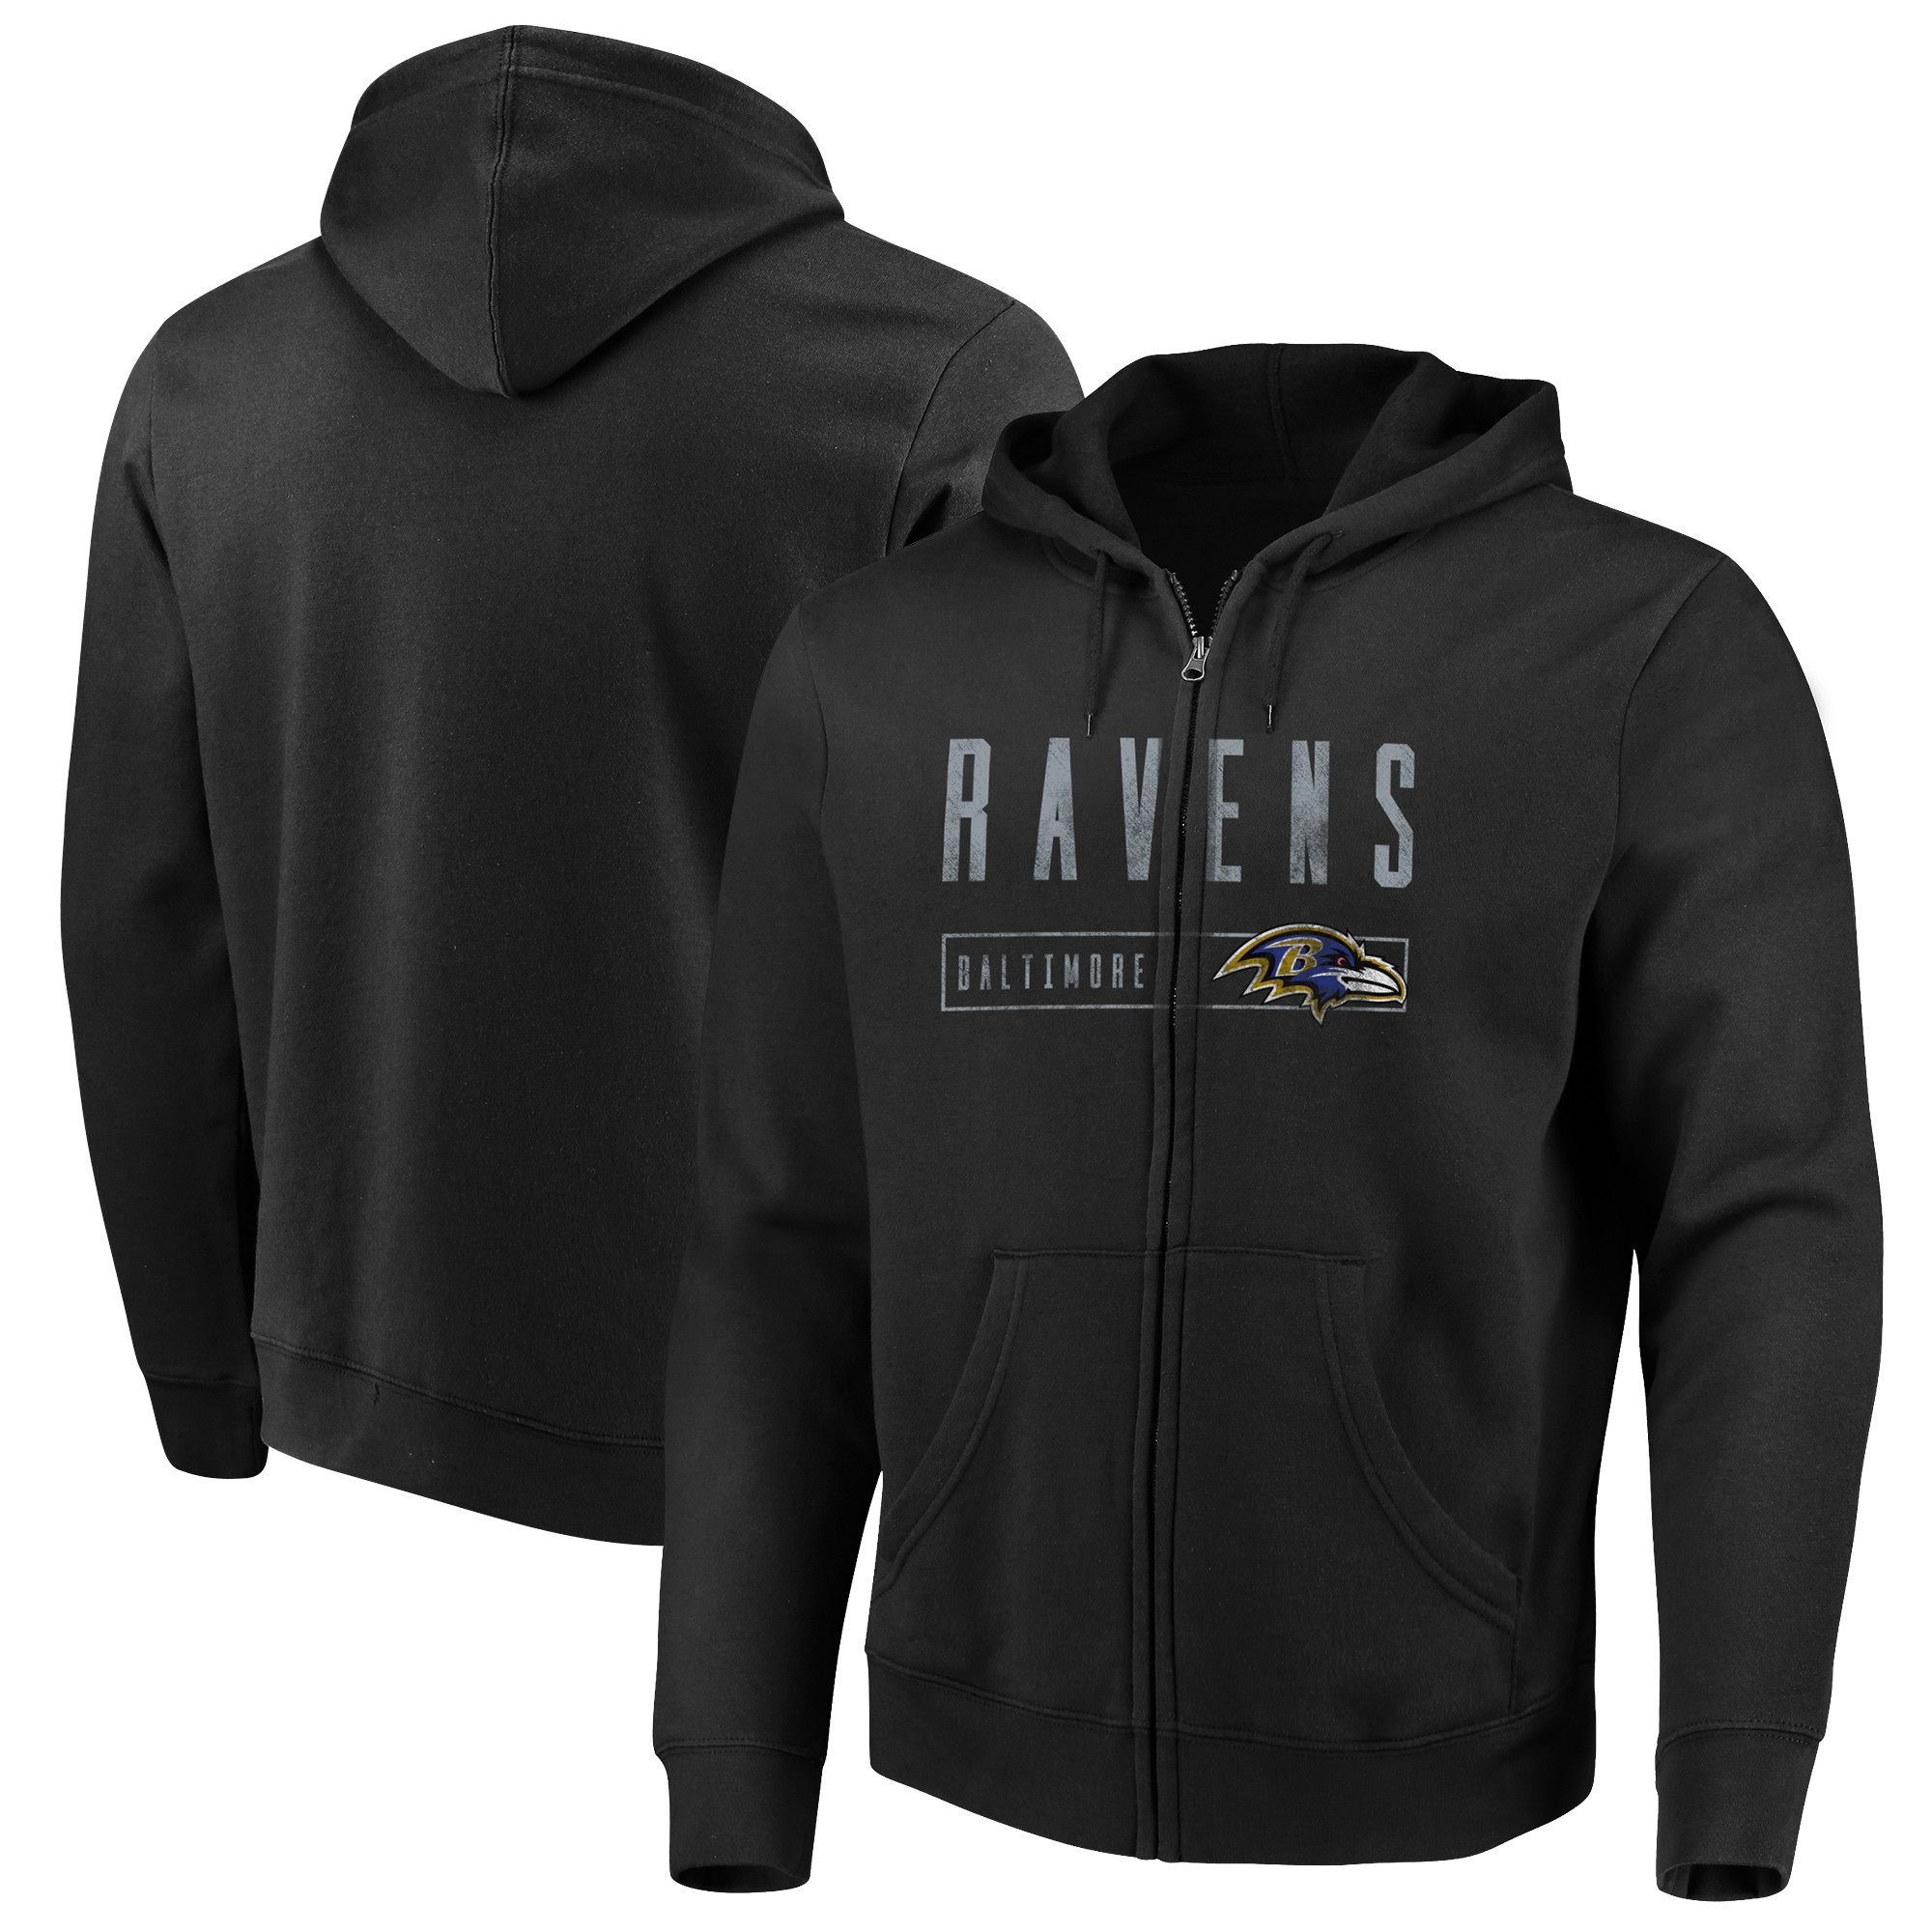 Baltimore Ravens Majestic Hyper Stack Full-Zip Hoodie - Black